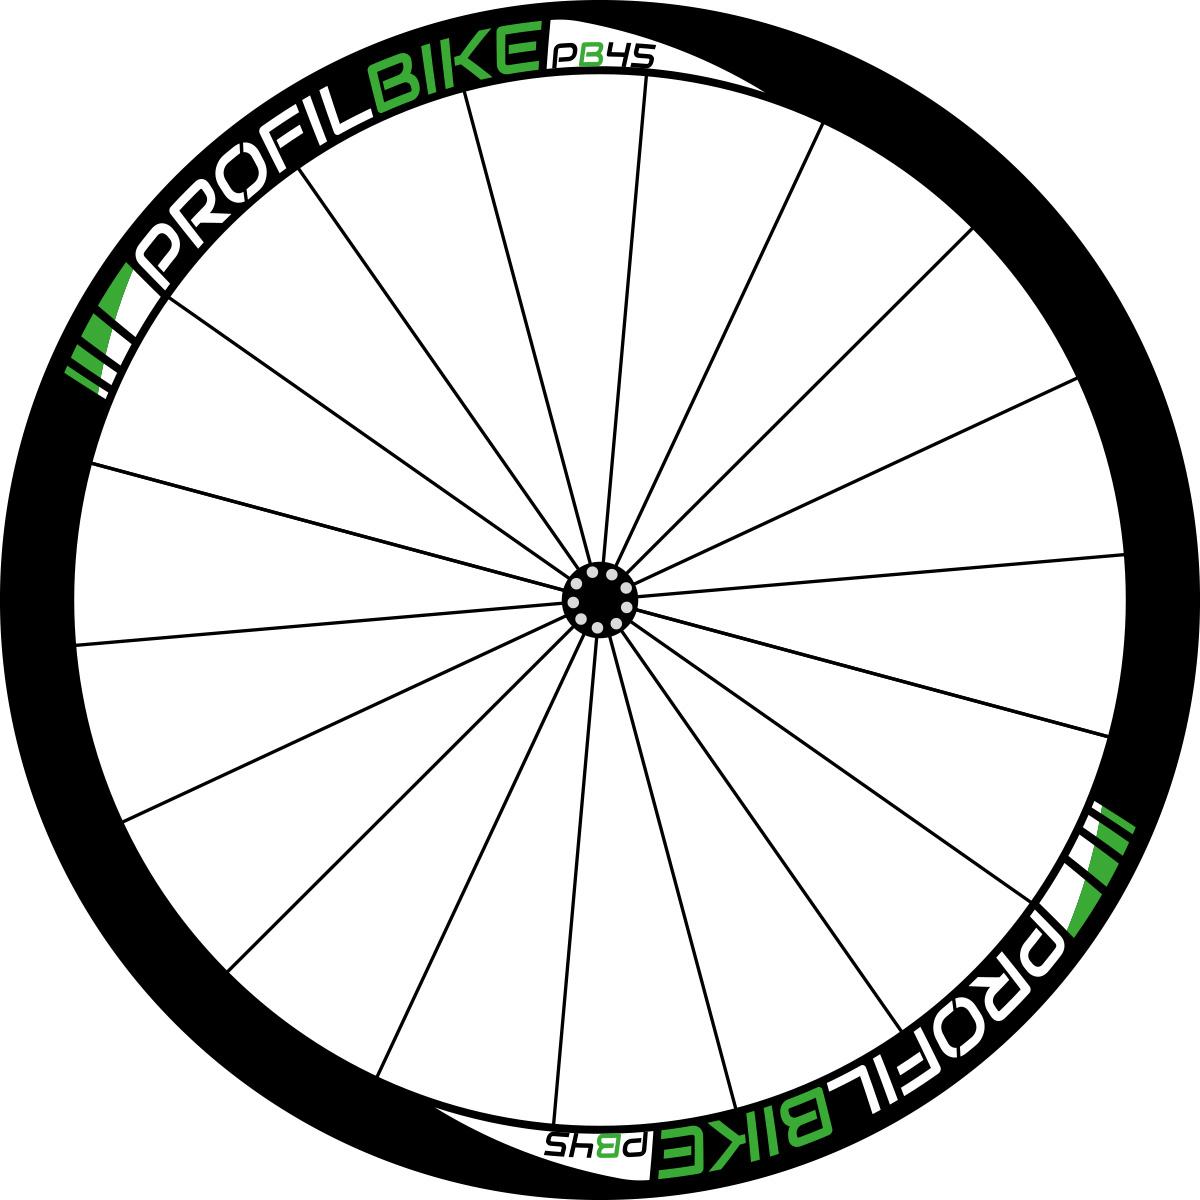 Profilbike PB45 CARBON DISC design vert